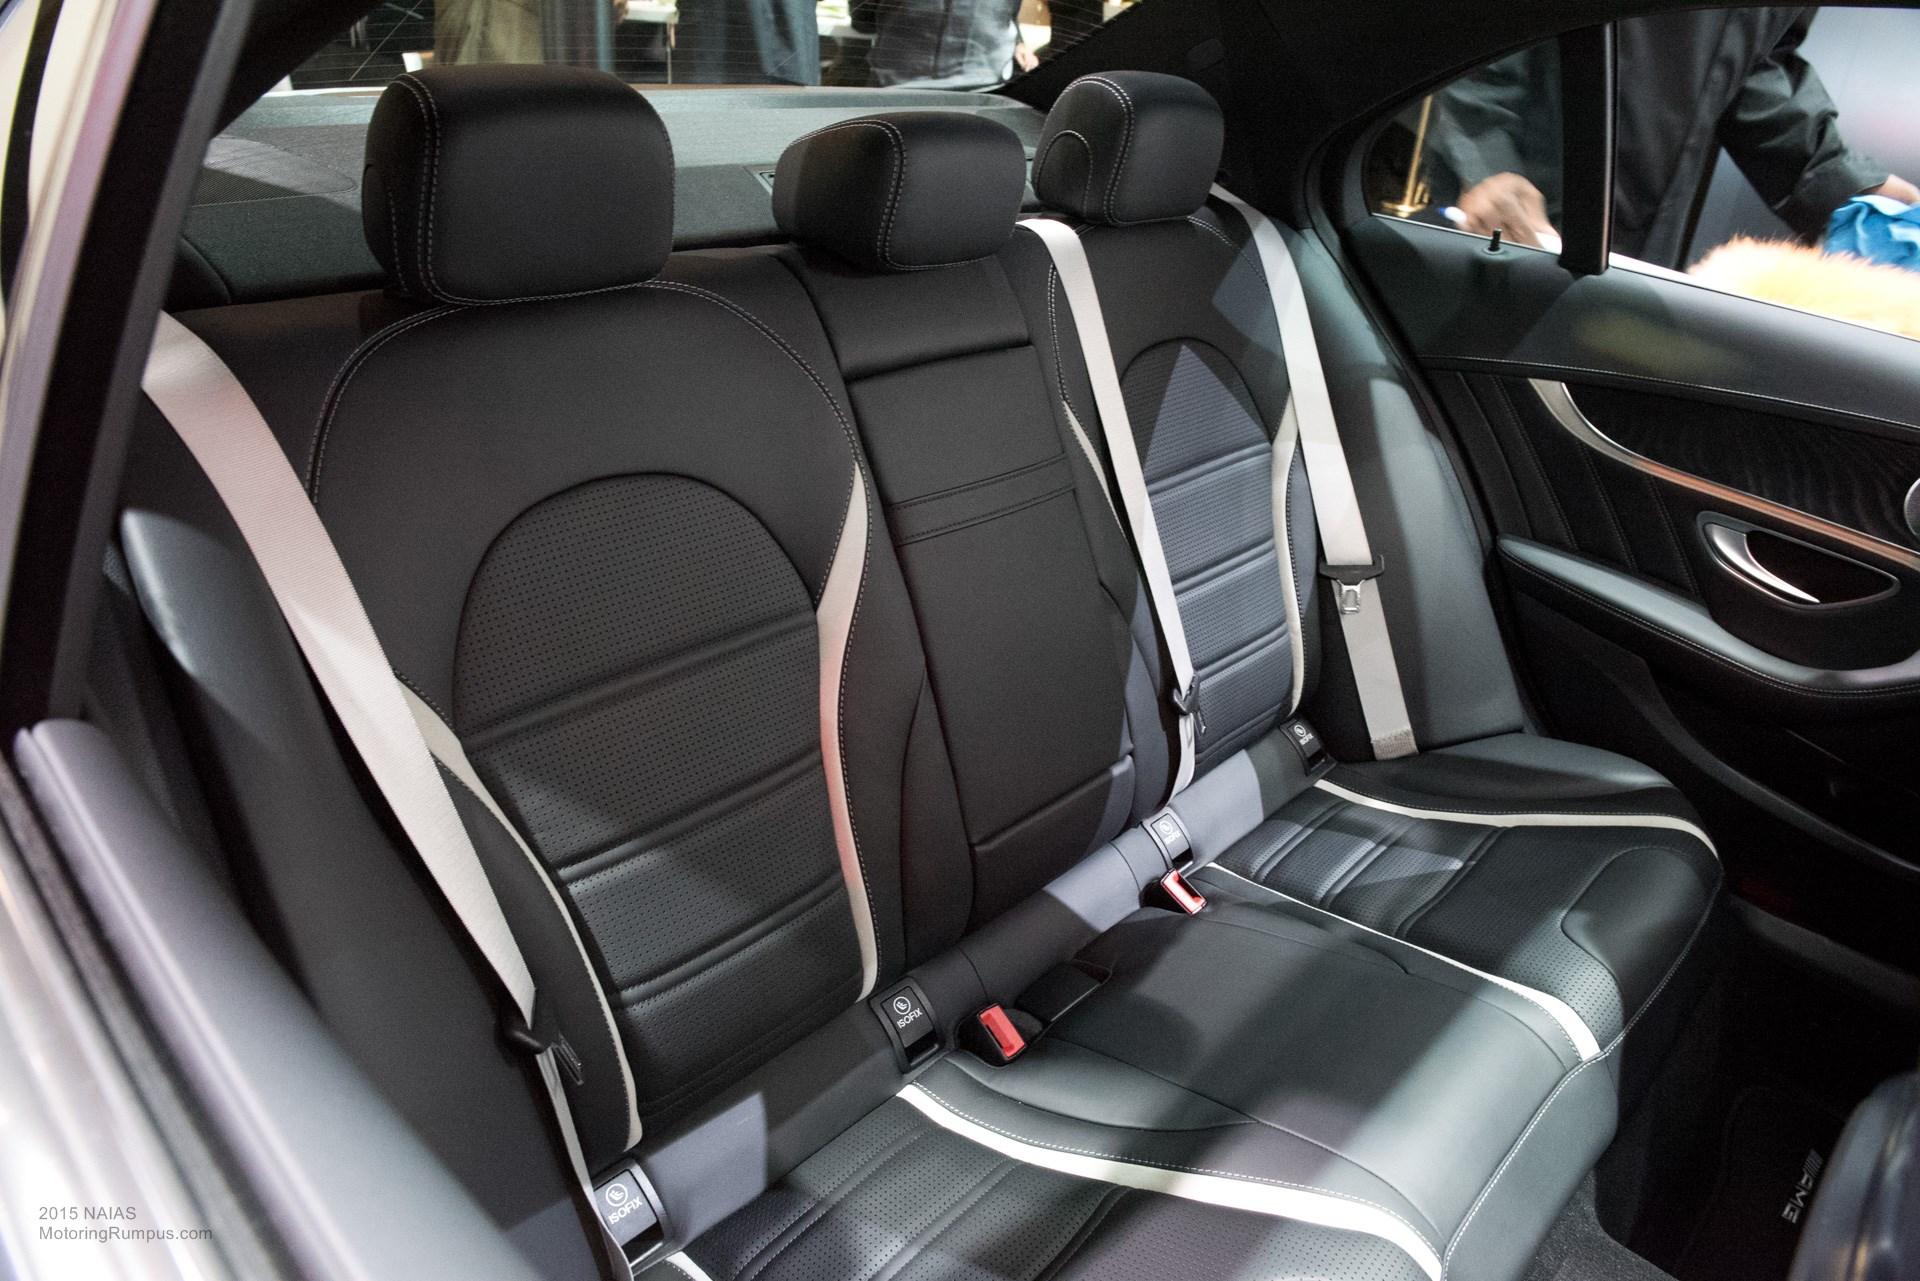 2015 NAIAS Mercedes-AMG C63 S Rear Seats - Motoring Rumpus